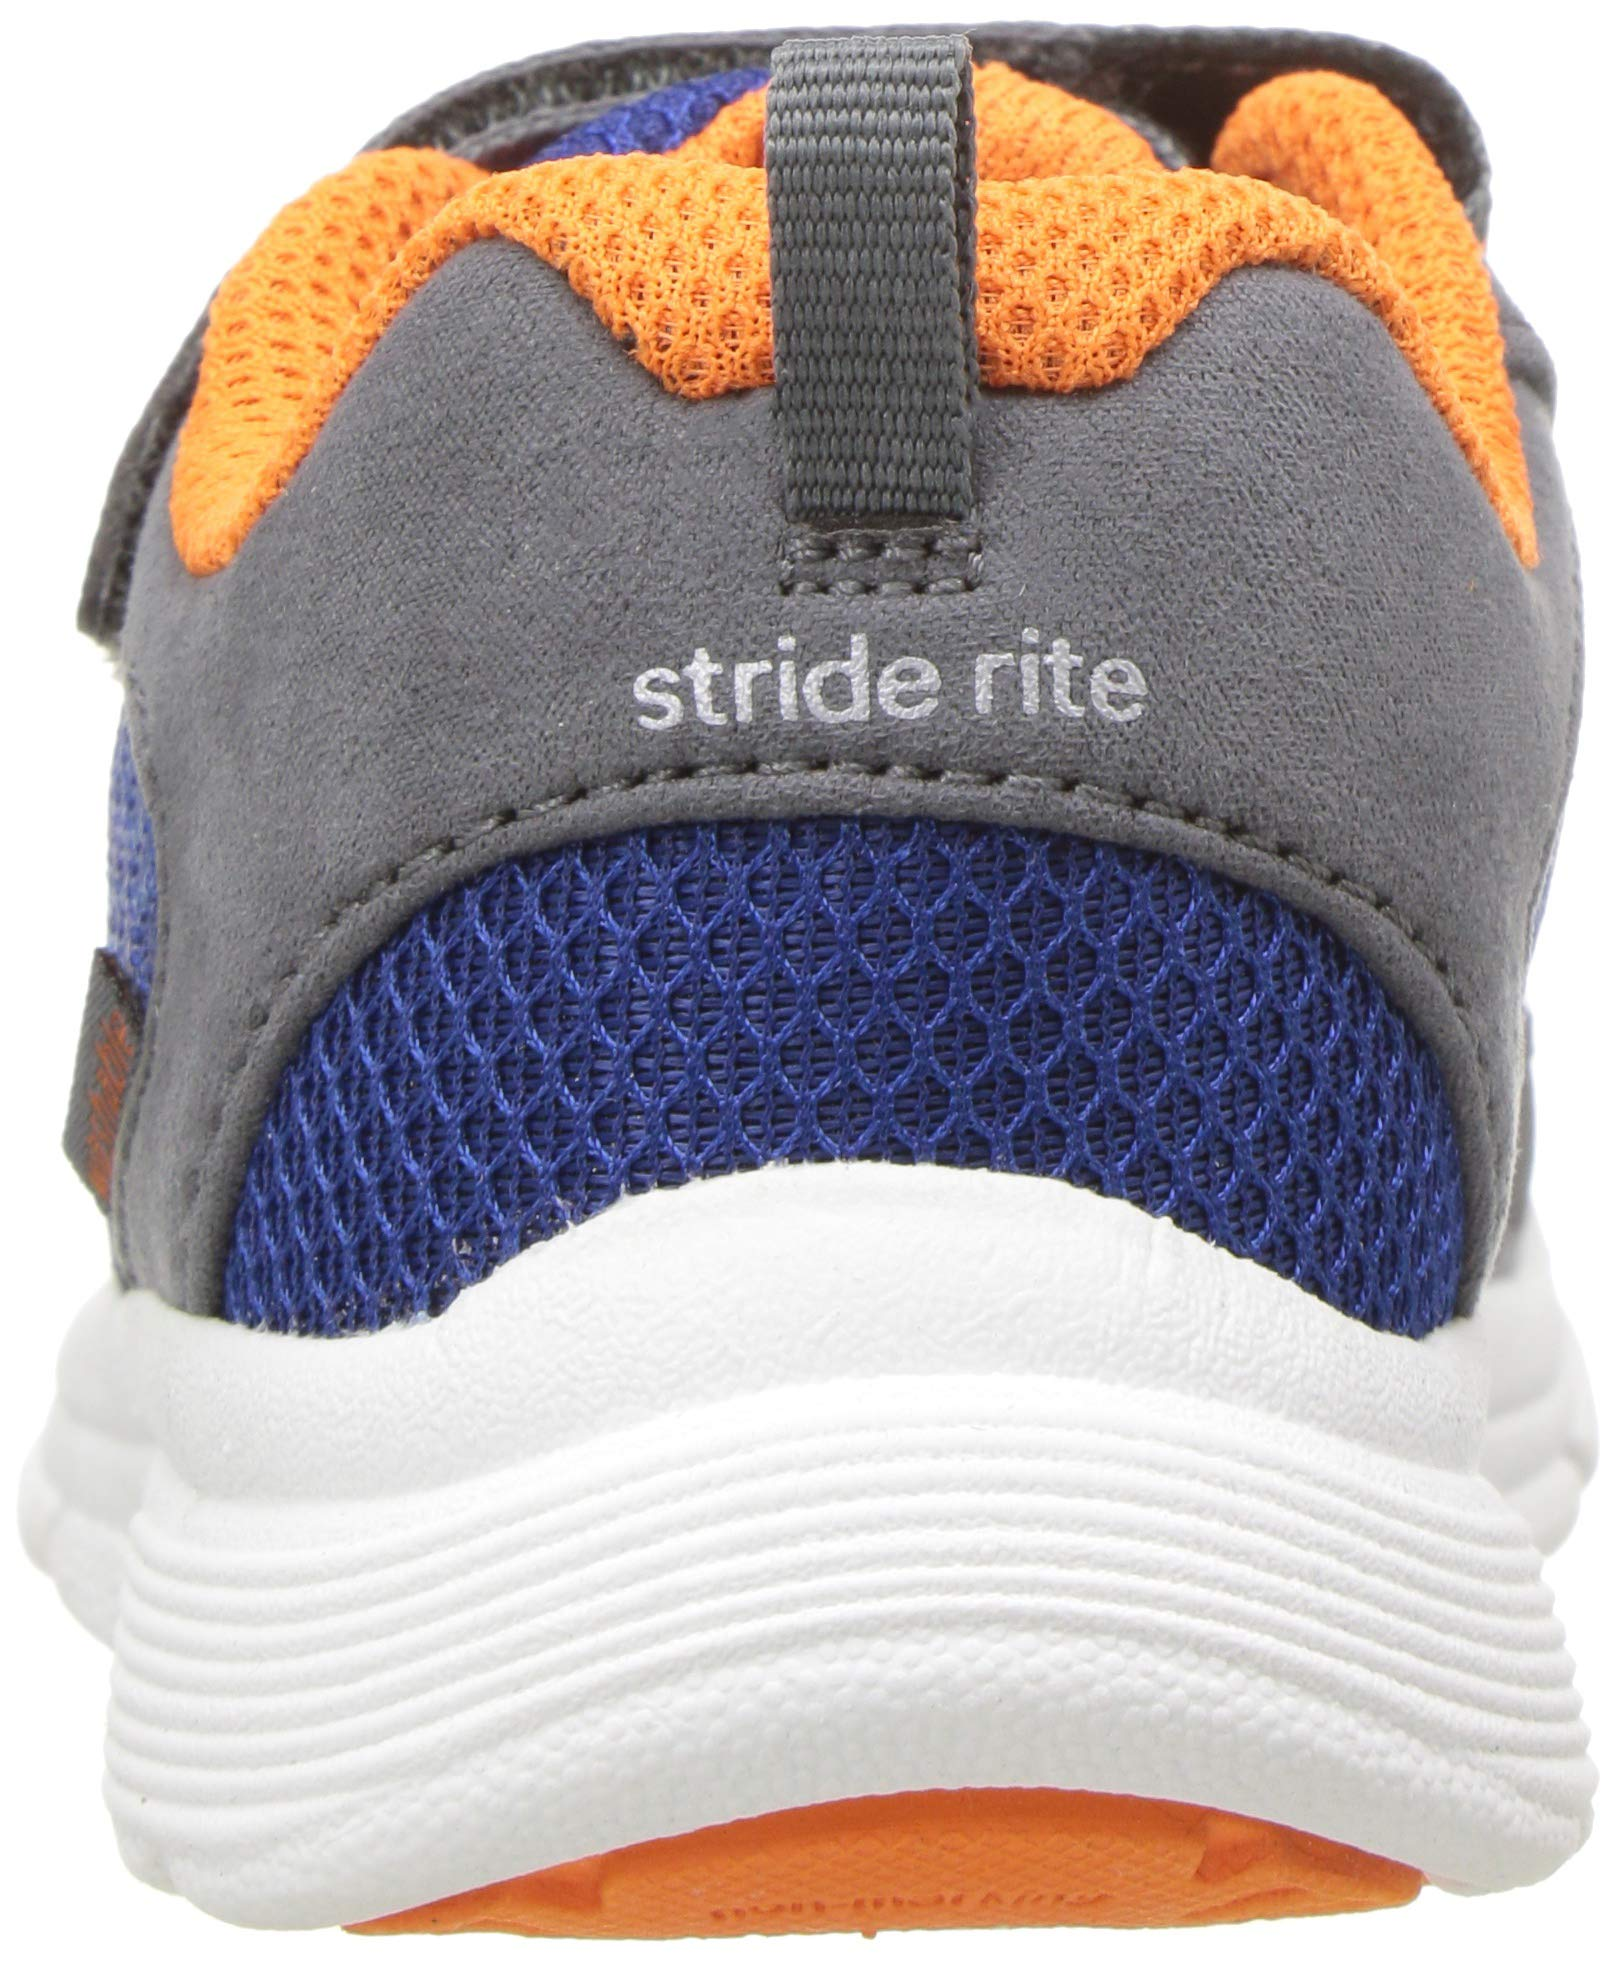 Stride Rite Boys' Made 2 Play Taylor Sneaker, Navy/Orange 7.5 M US Toddler by Stride Rite (Image #2)